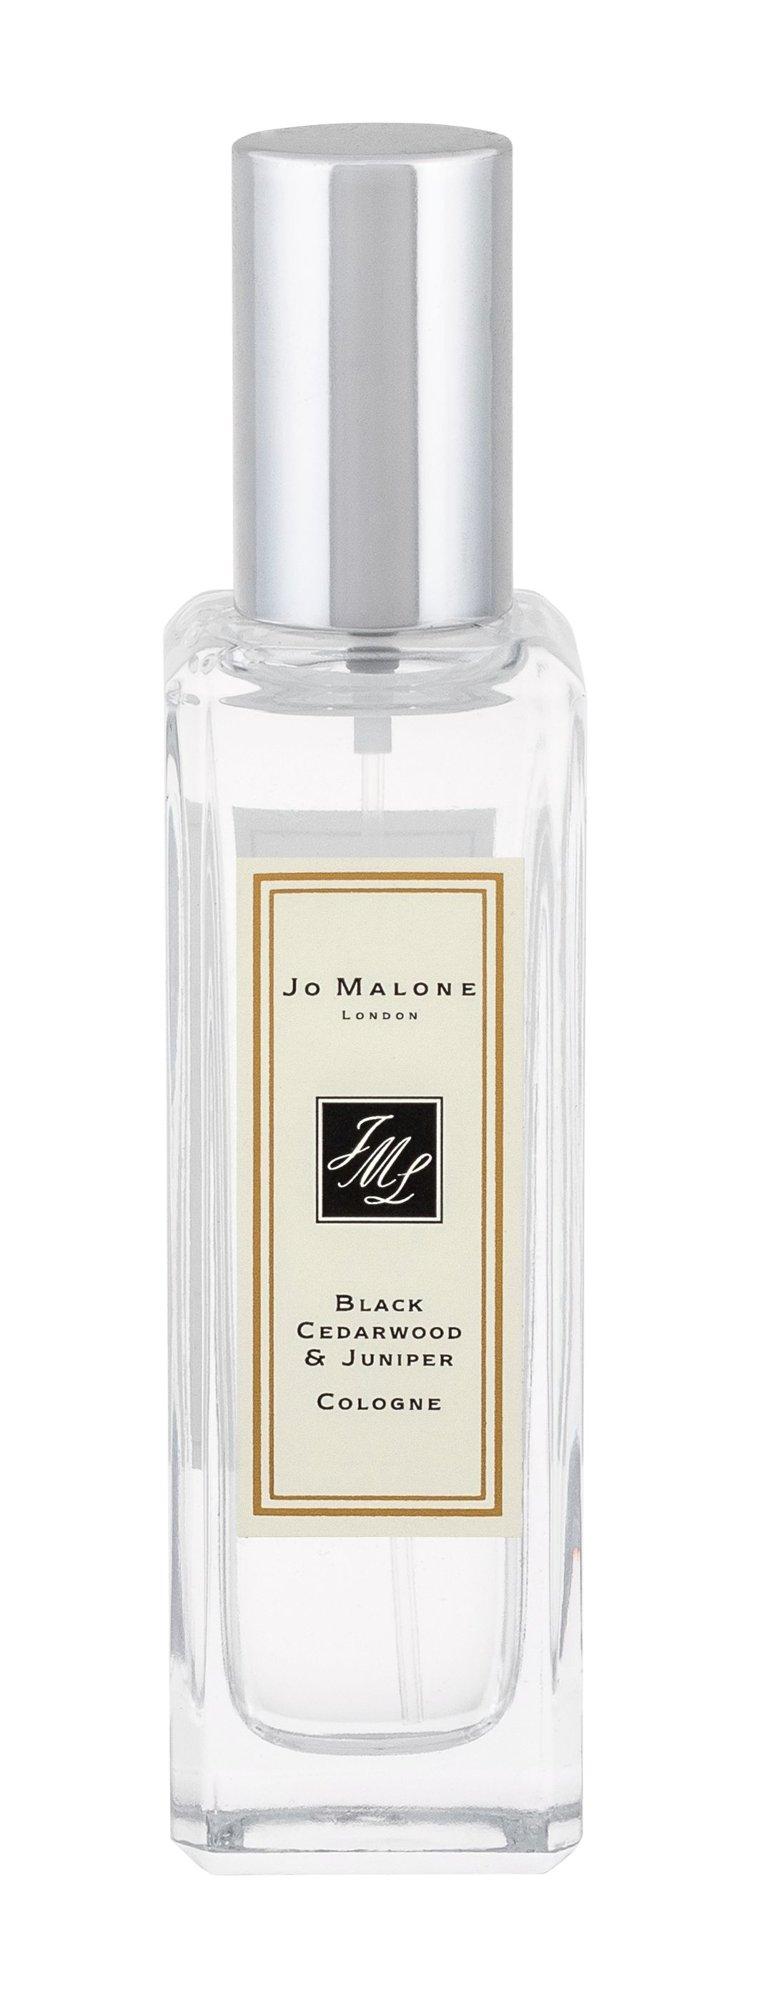 Jo Malone Black Cedarwood & Juniper Eau de Cologne 30ml